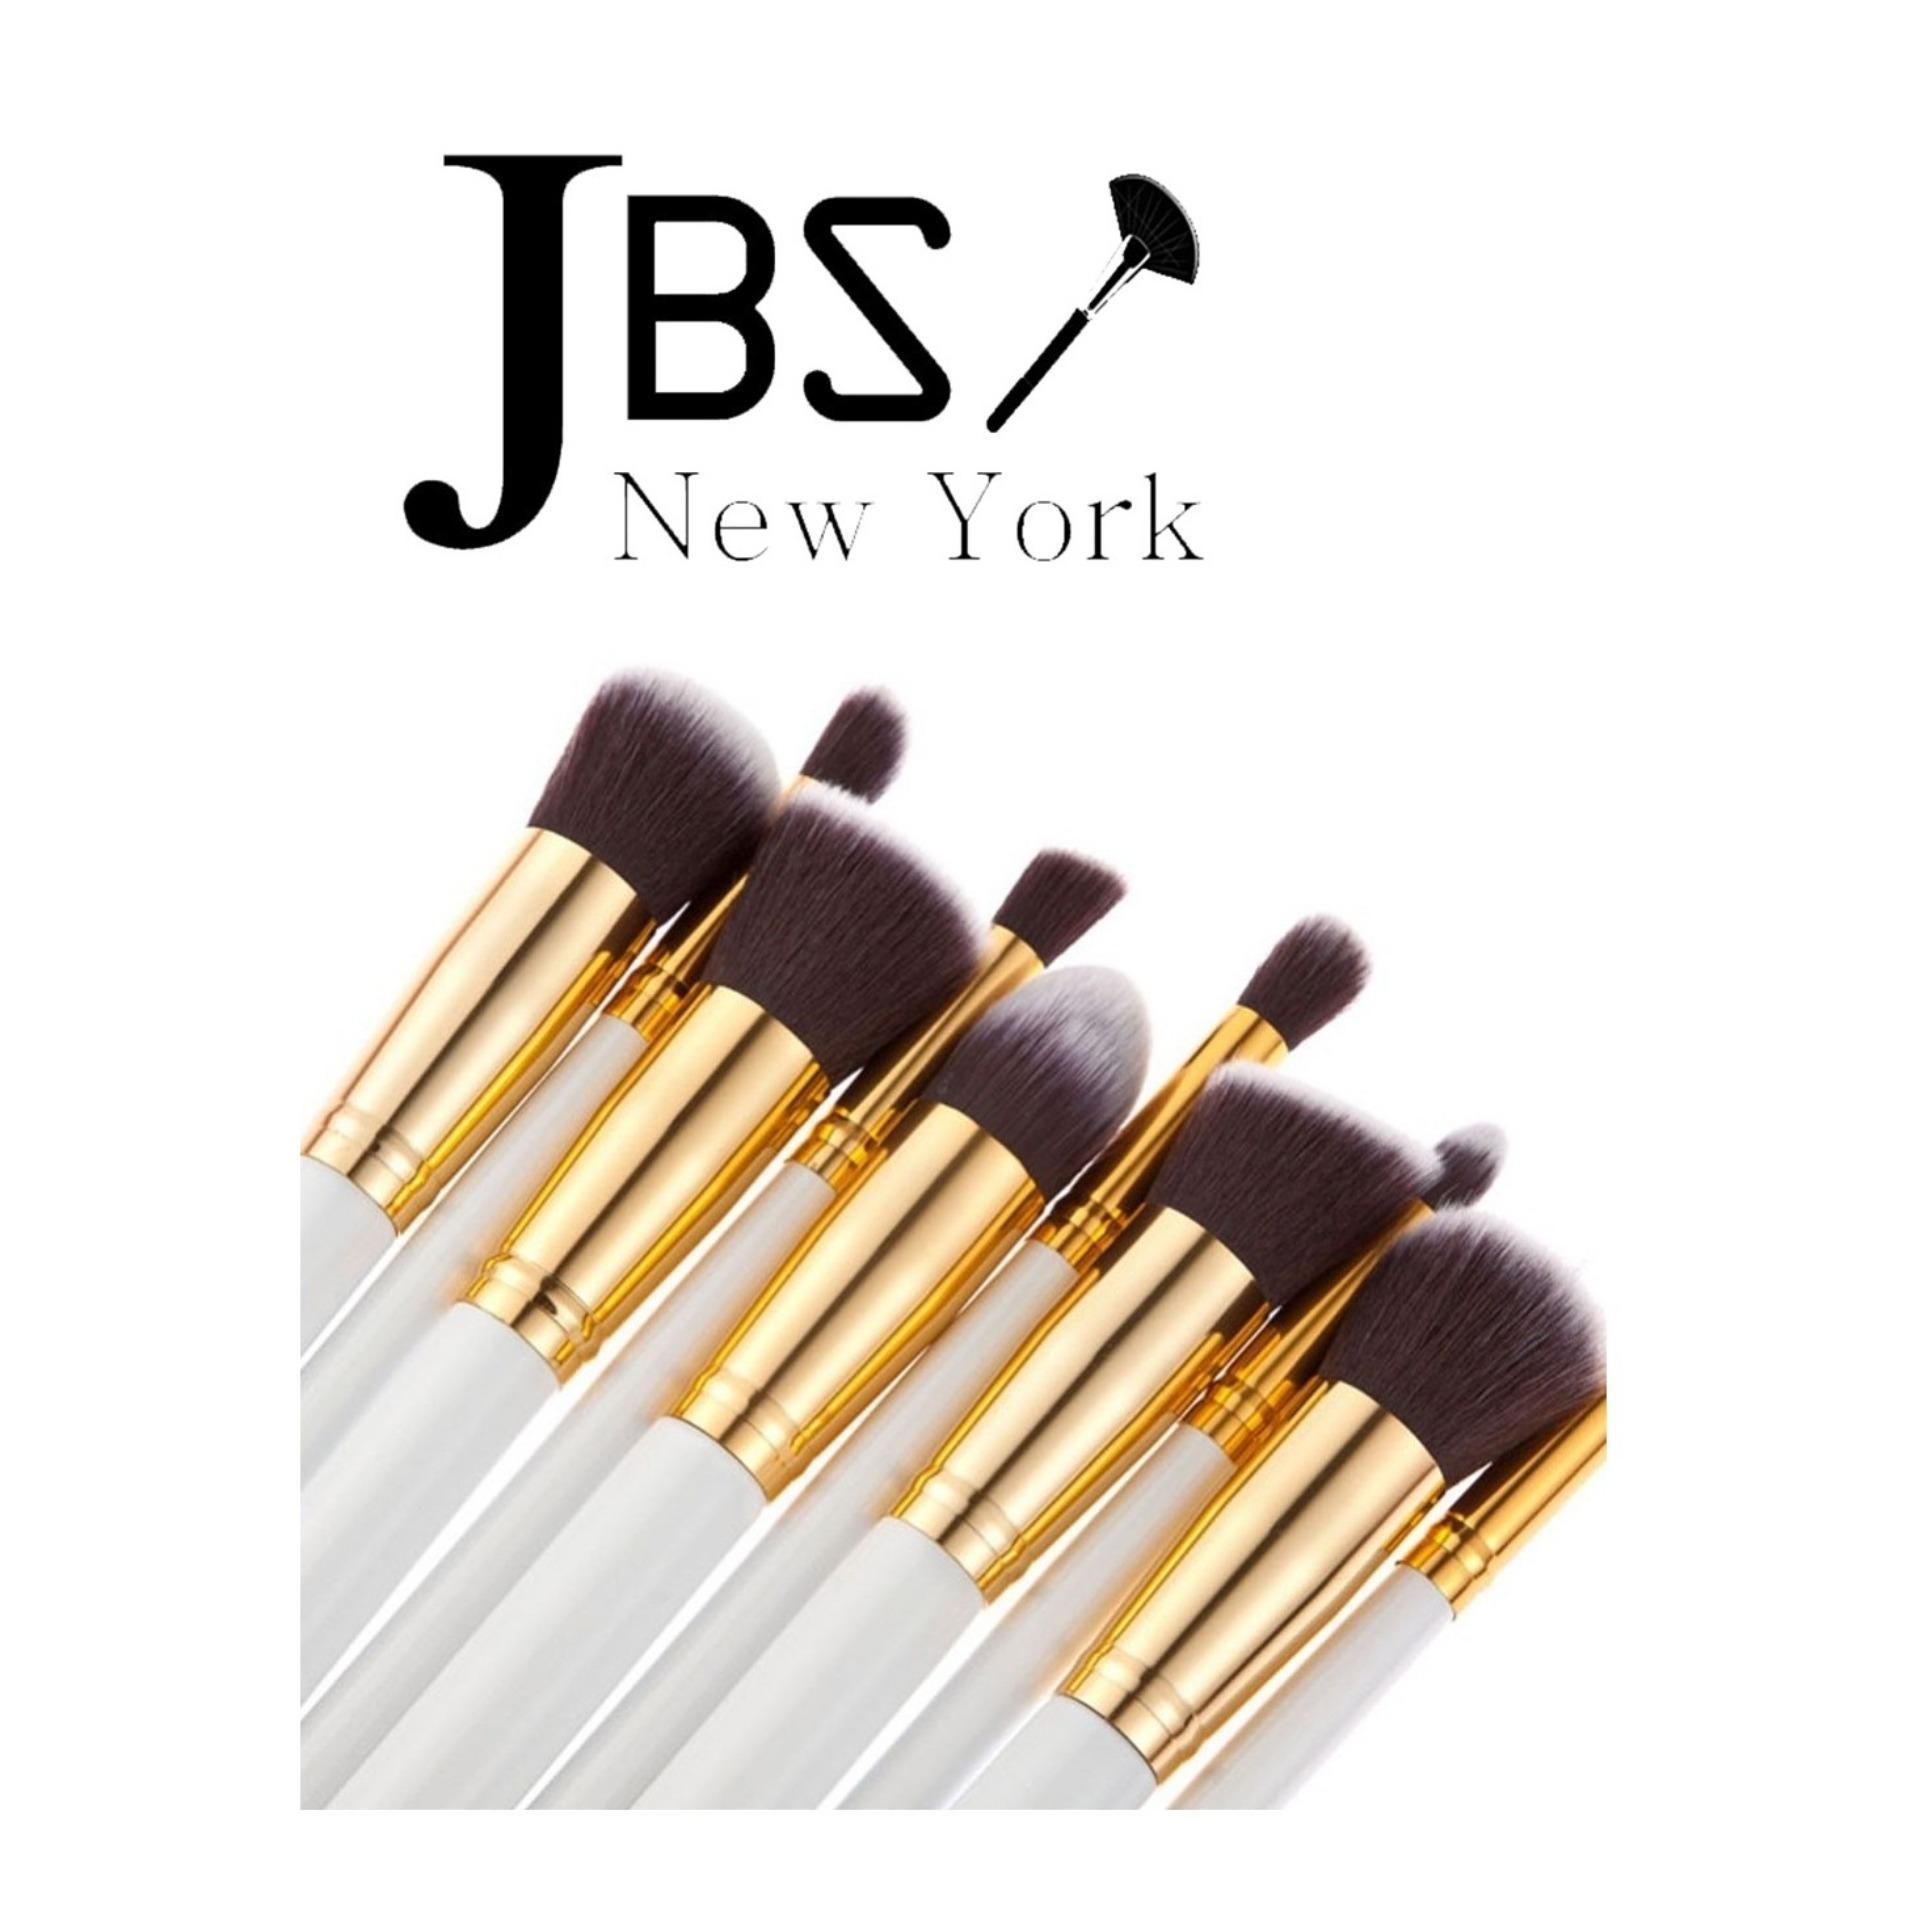 Fitur Jbs New York Makeup Brush Kuas Set Bundle Little Make Up Detail Gambar Foundation White Gold Spon Beauty K011 Terbaru